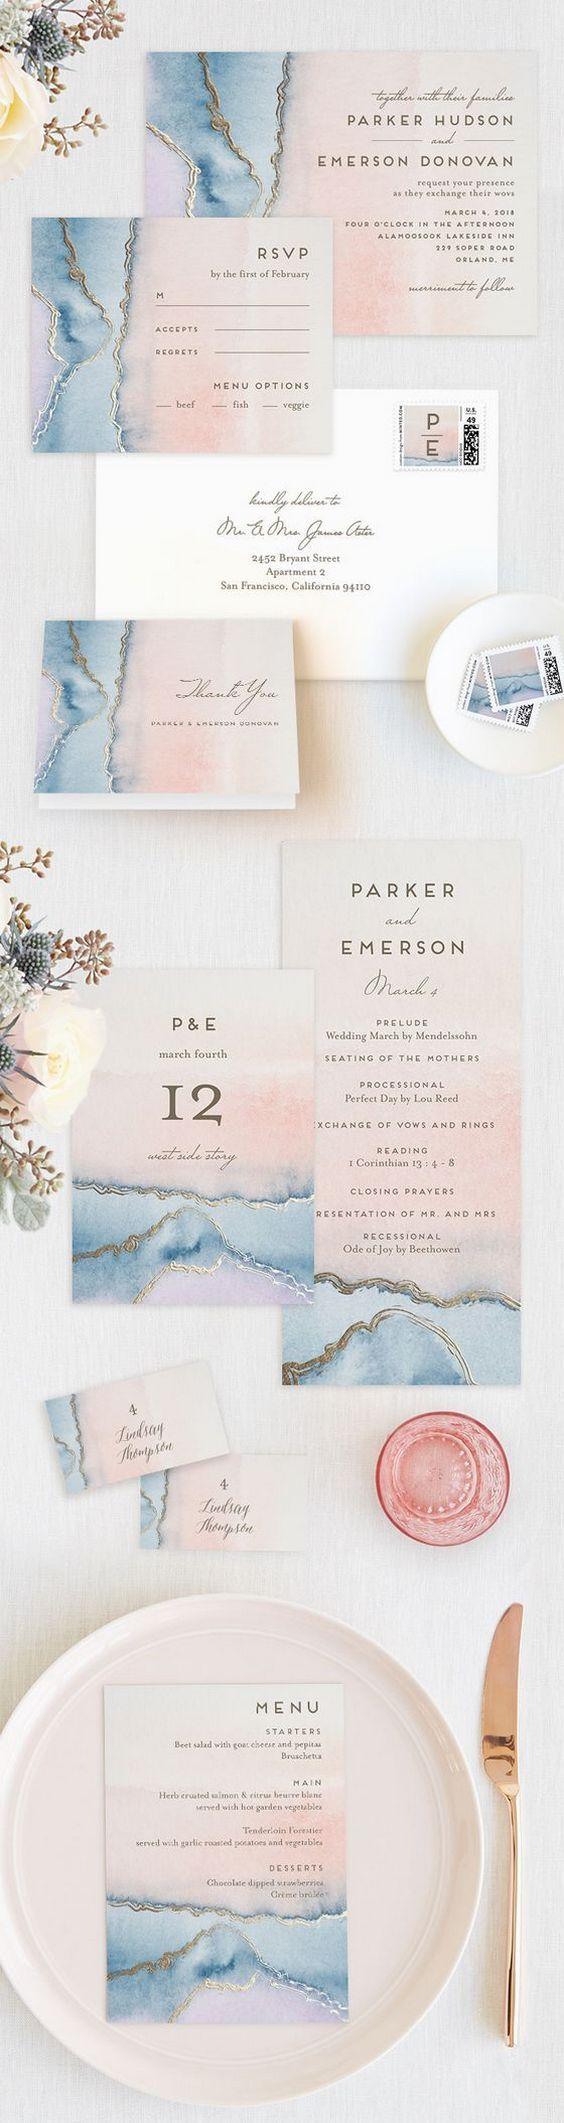 Geode Wedding Ideas / http://www.himisspuff.com/geode-wedding-ideas/9/